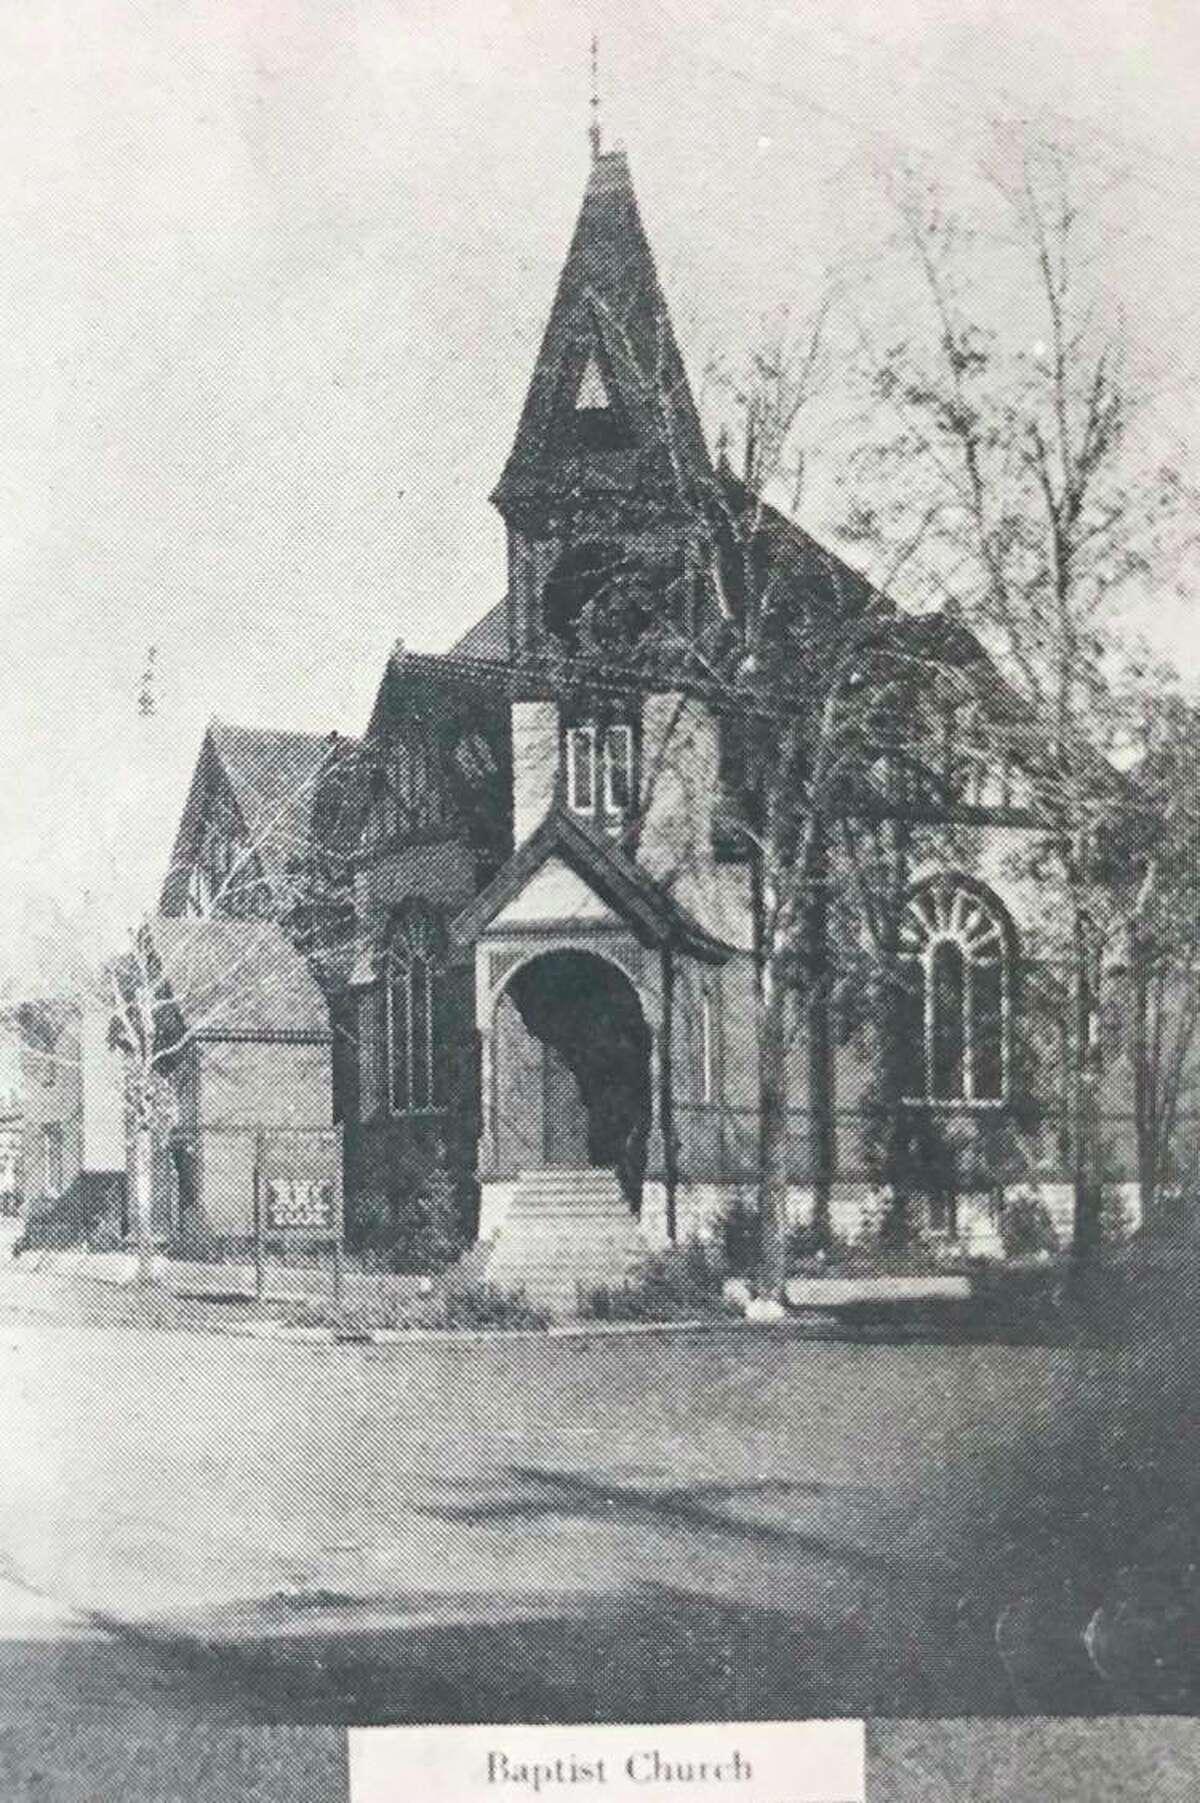 First Baptist Church. 1926